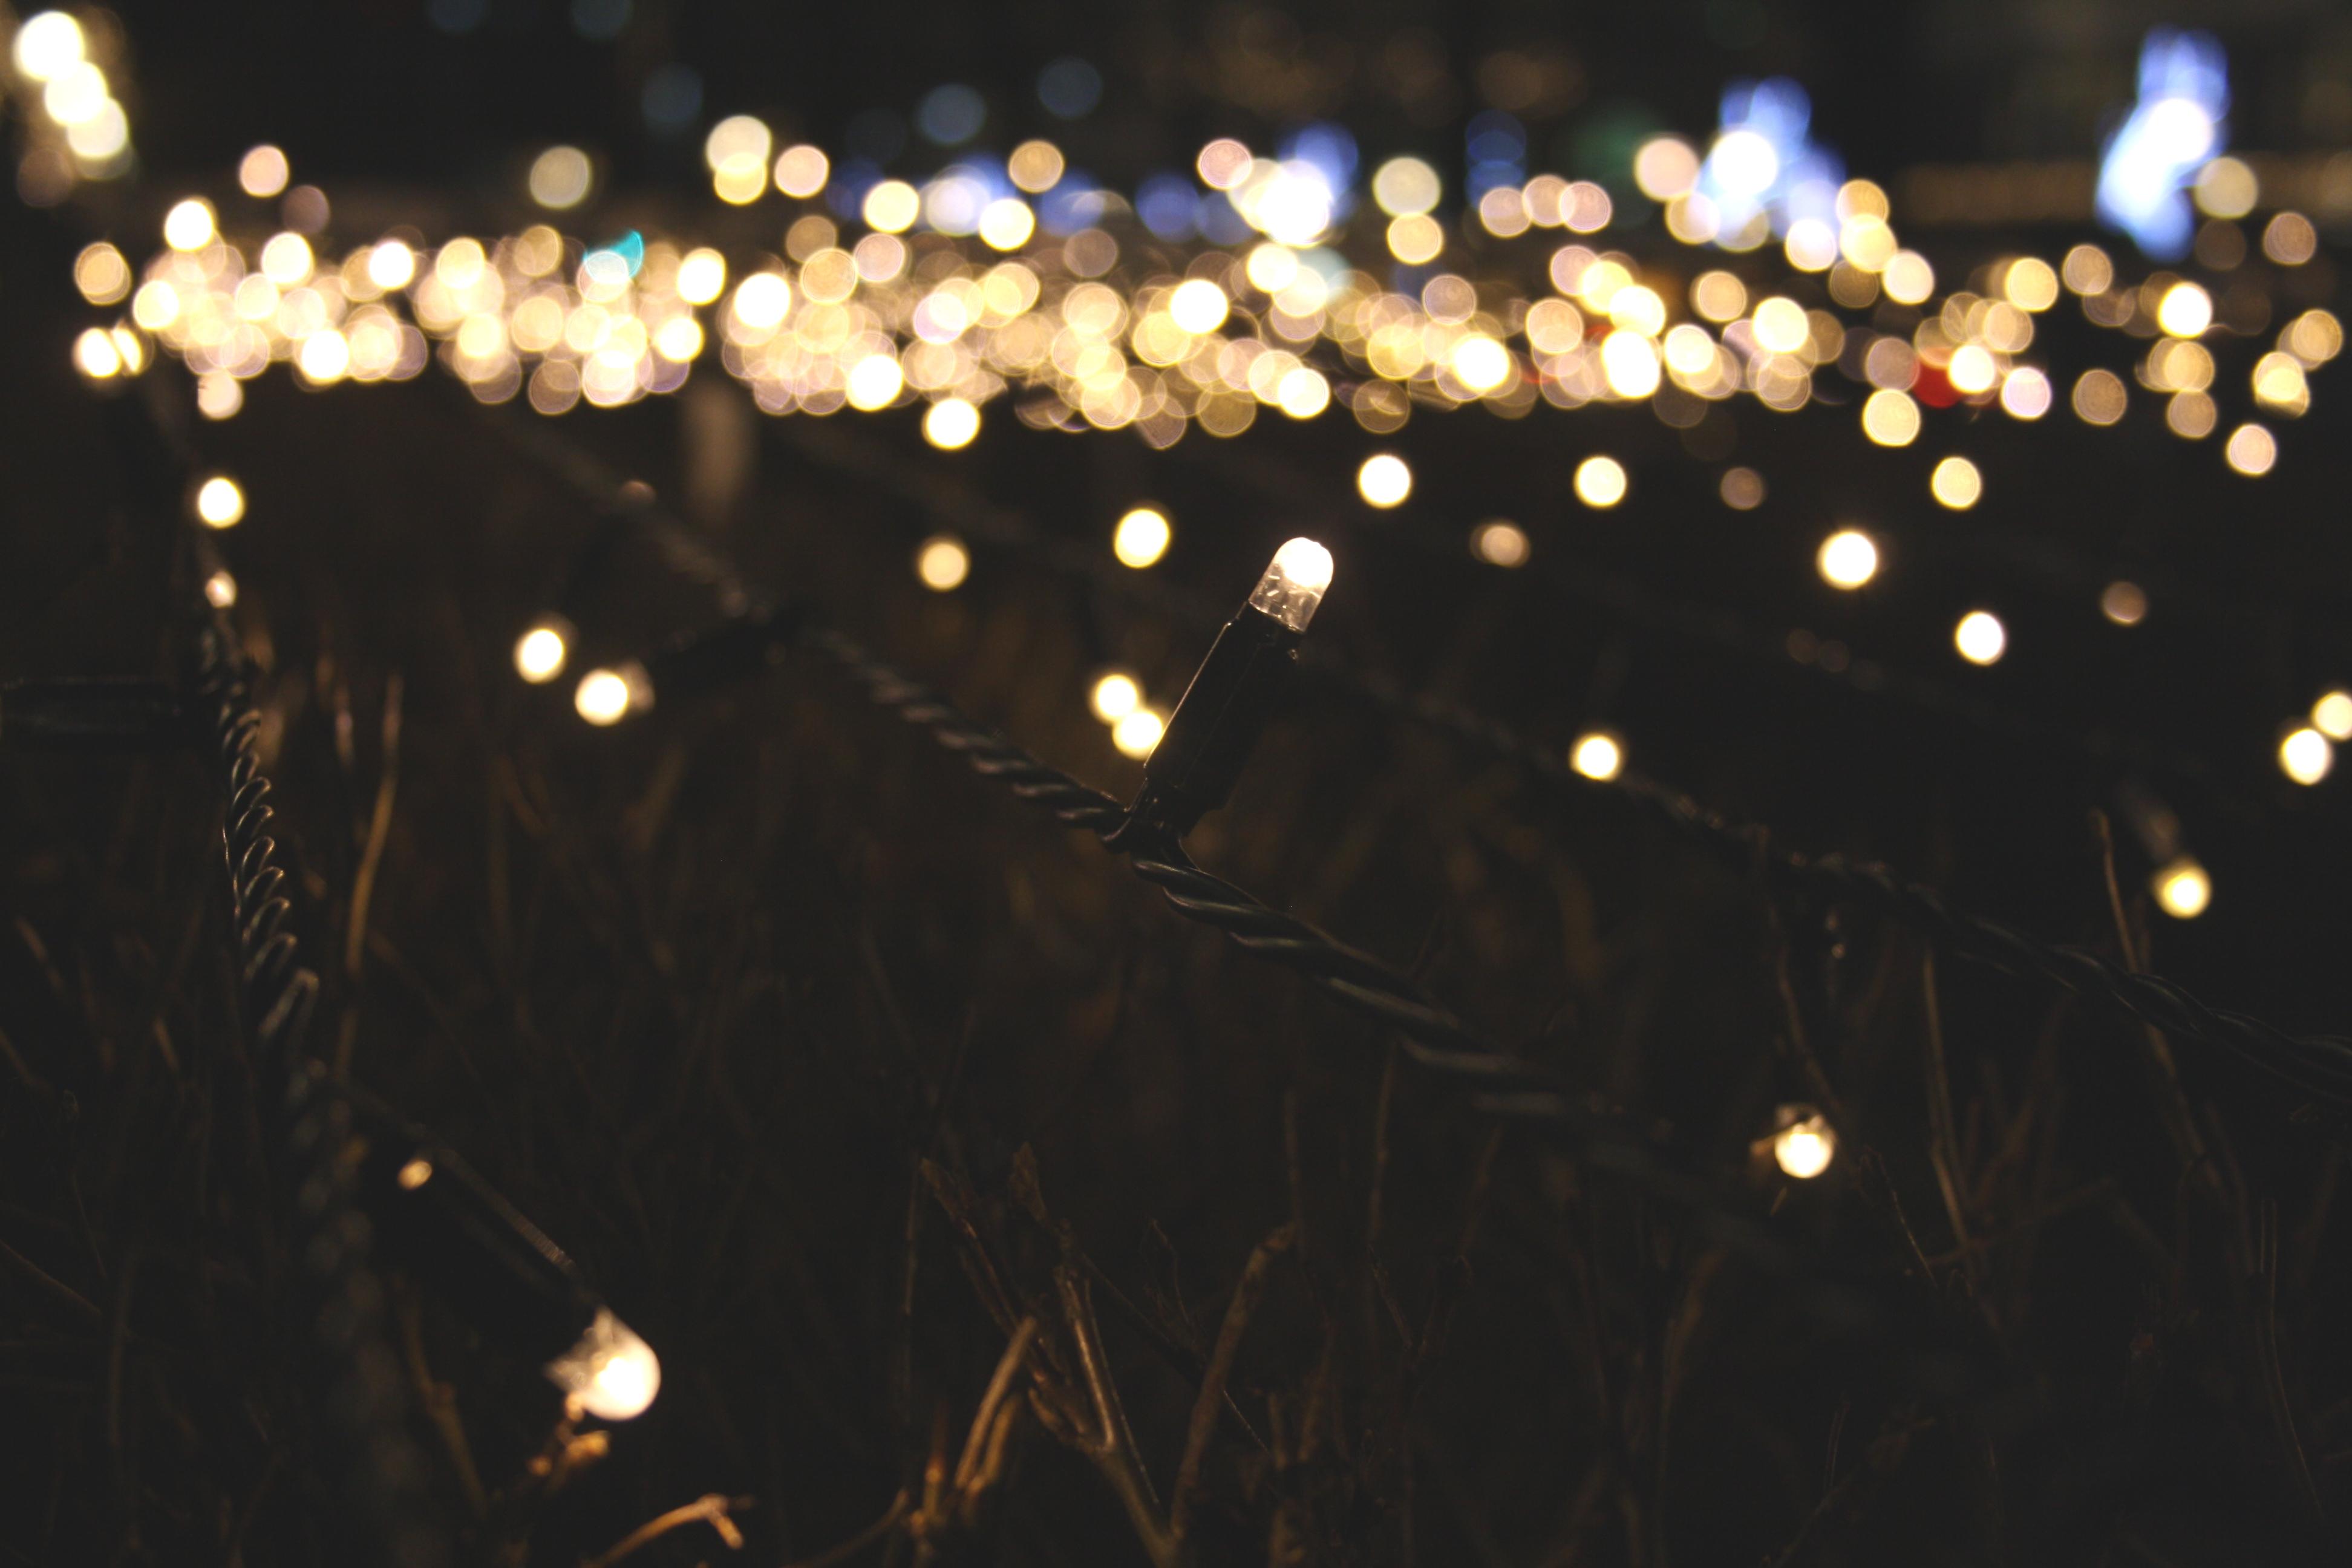 light bokeh blur night sunlight flower dark sparkler decoration darkness black lighting close up focus shining